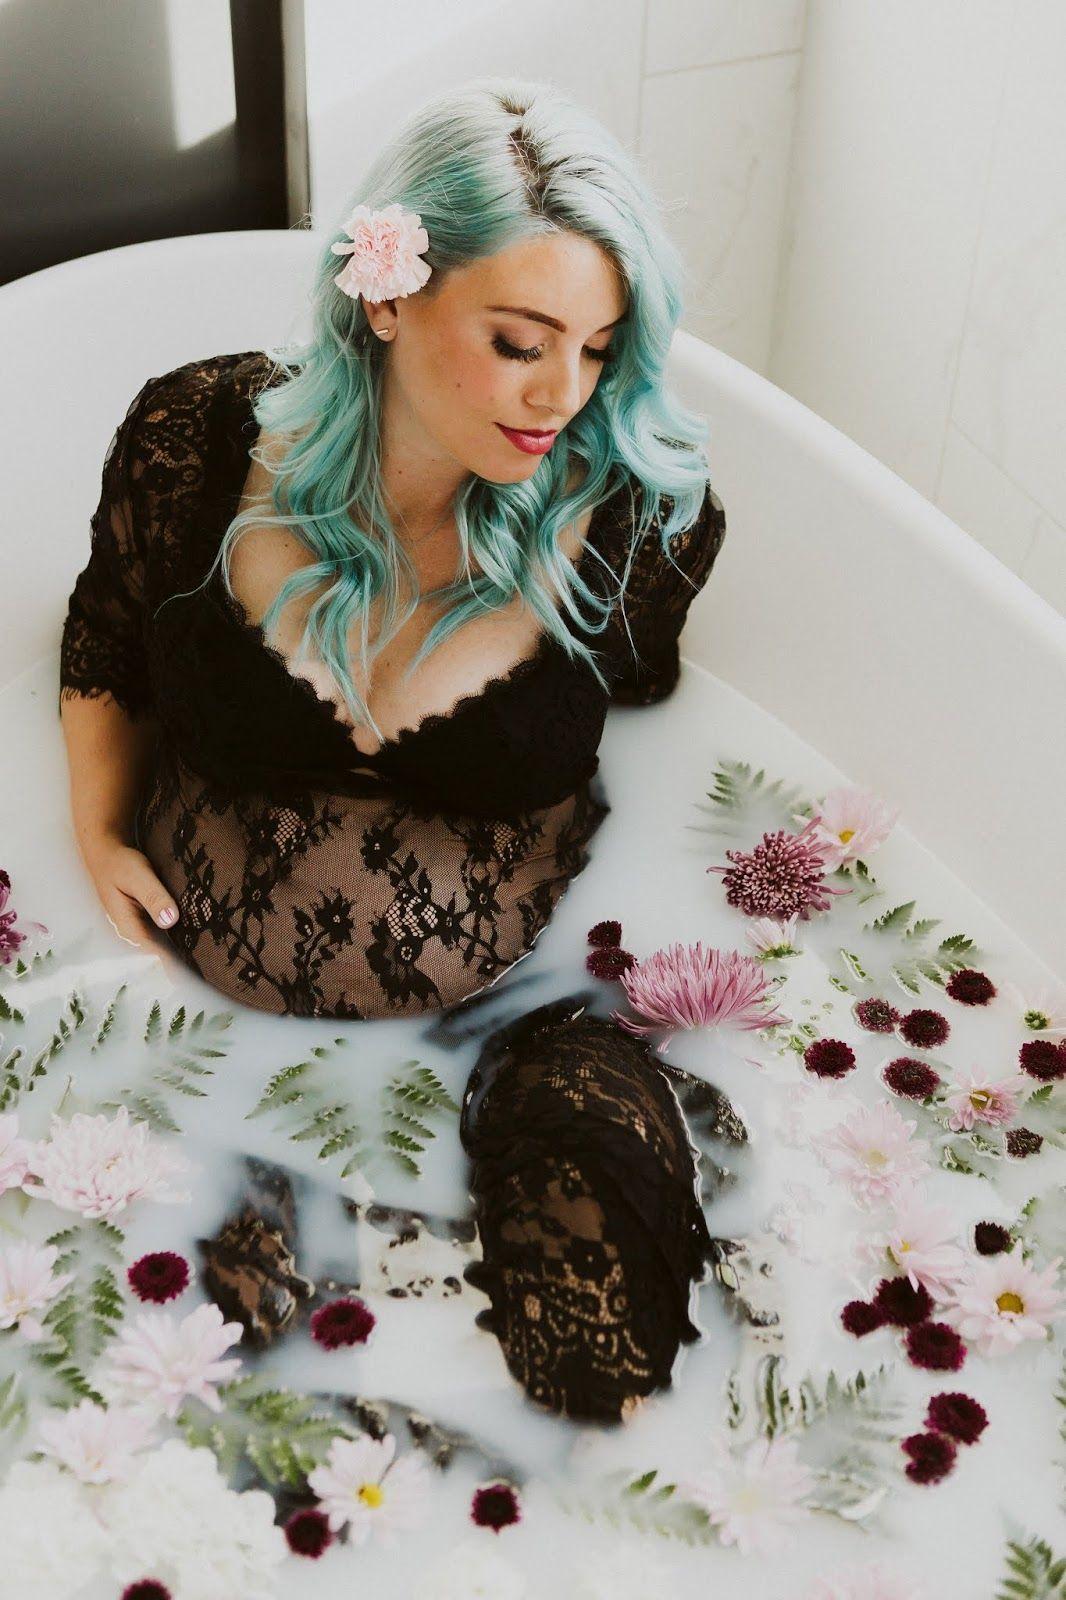 MILK BATH MATERNITY SHOOT #fallmilkbathbaby MILK BATH MATERNITY SHOOT |The Red Closet Diary | Instagram: @ jalynnschroeder | maternity, maternity dress, blue hair, milk bath, floral milk bath, 38 weeks, second pregnancy, belly bump. #milkbath